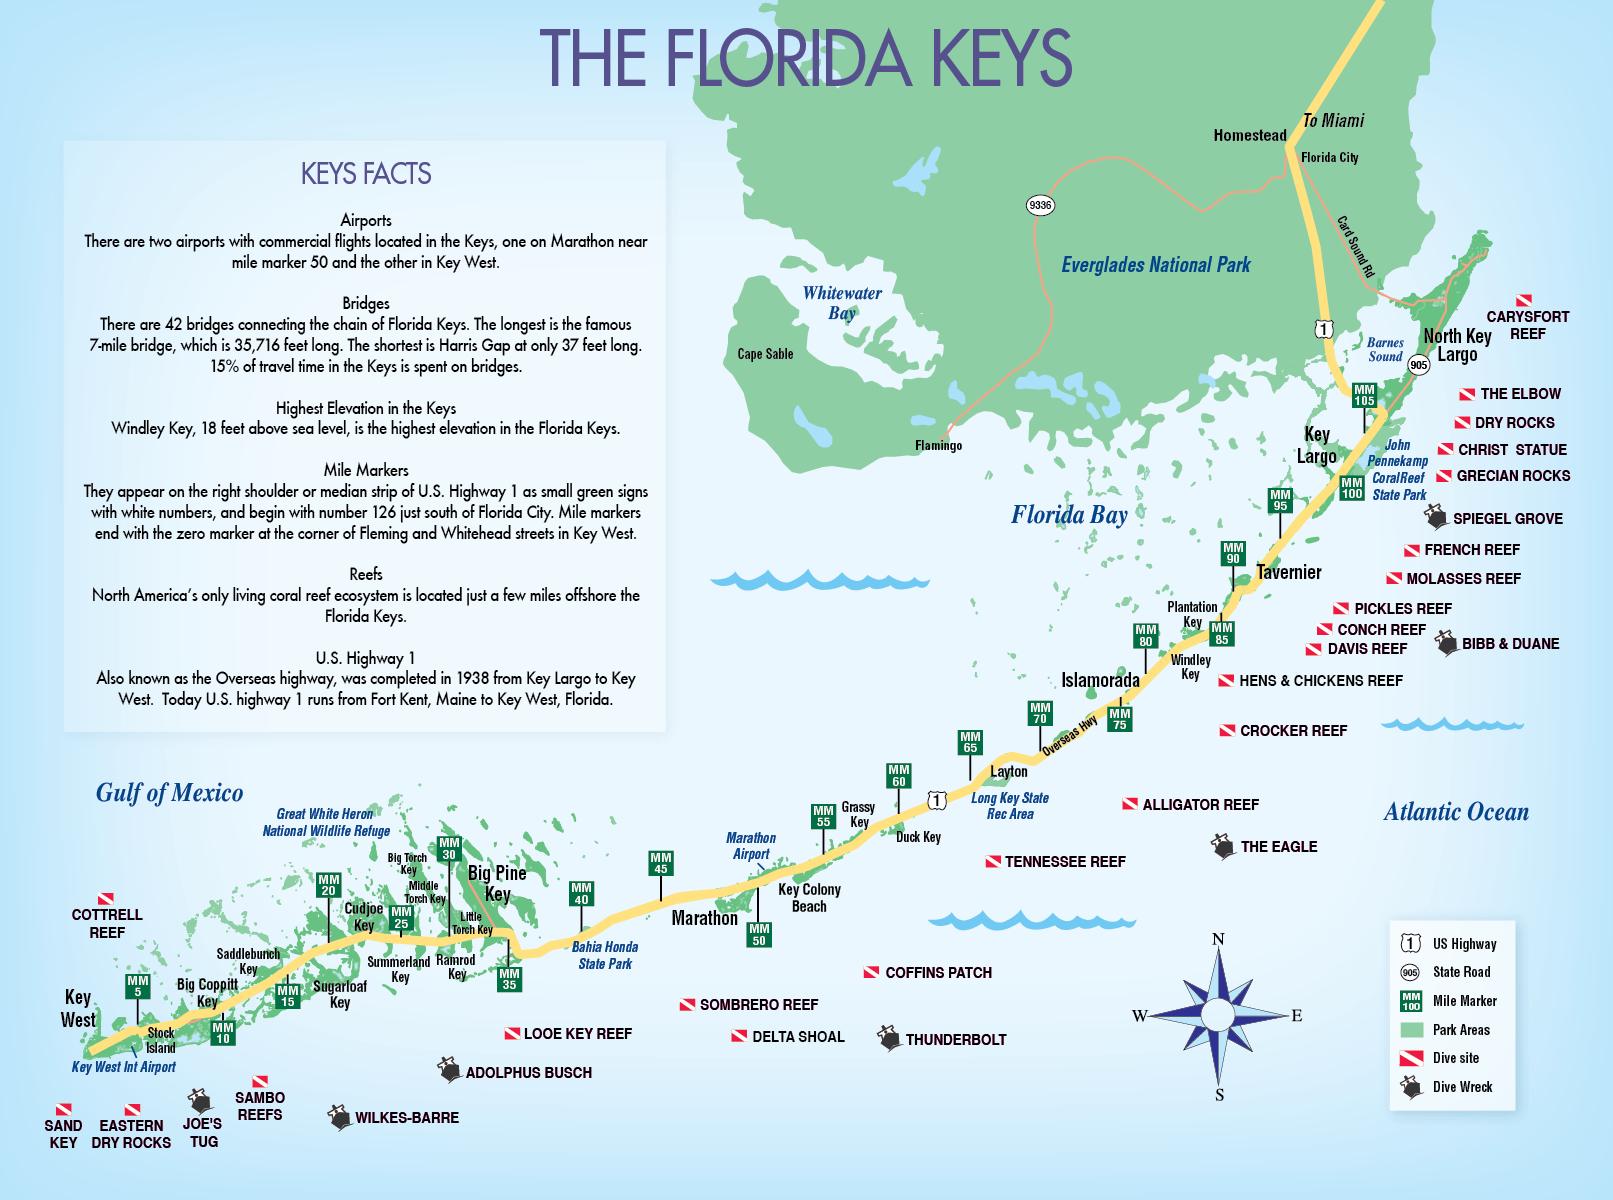 Keys & Key West Map Pdfs - Destination - Florida Keys Map With Mile Markers